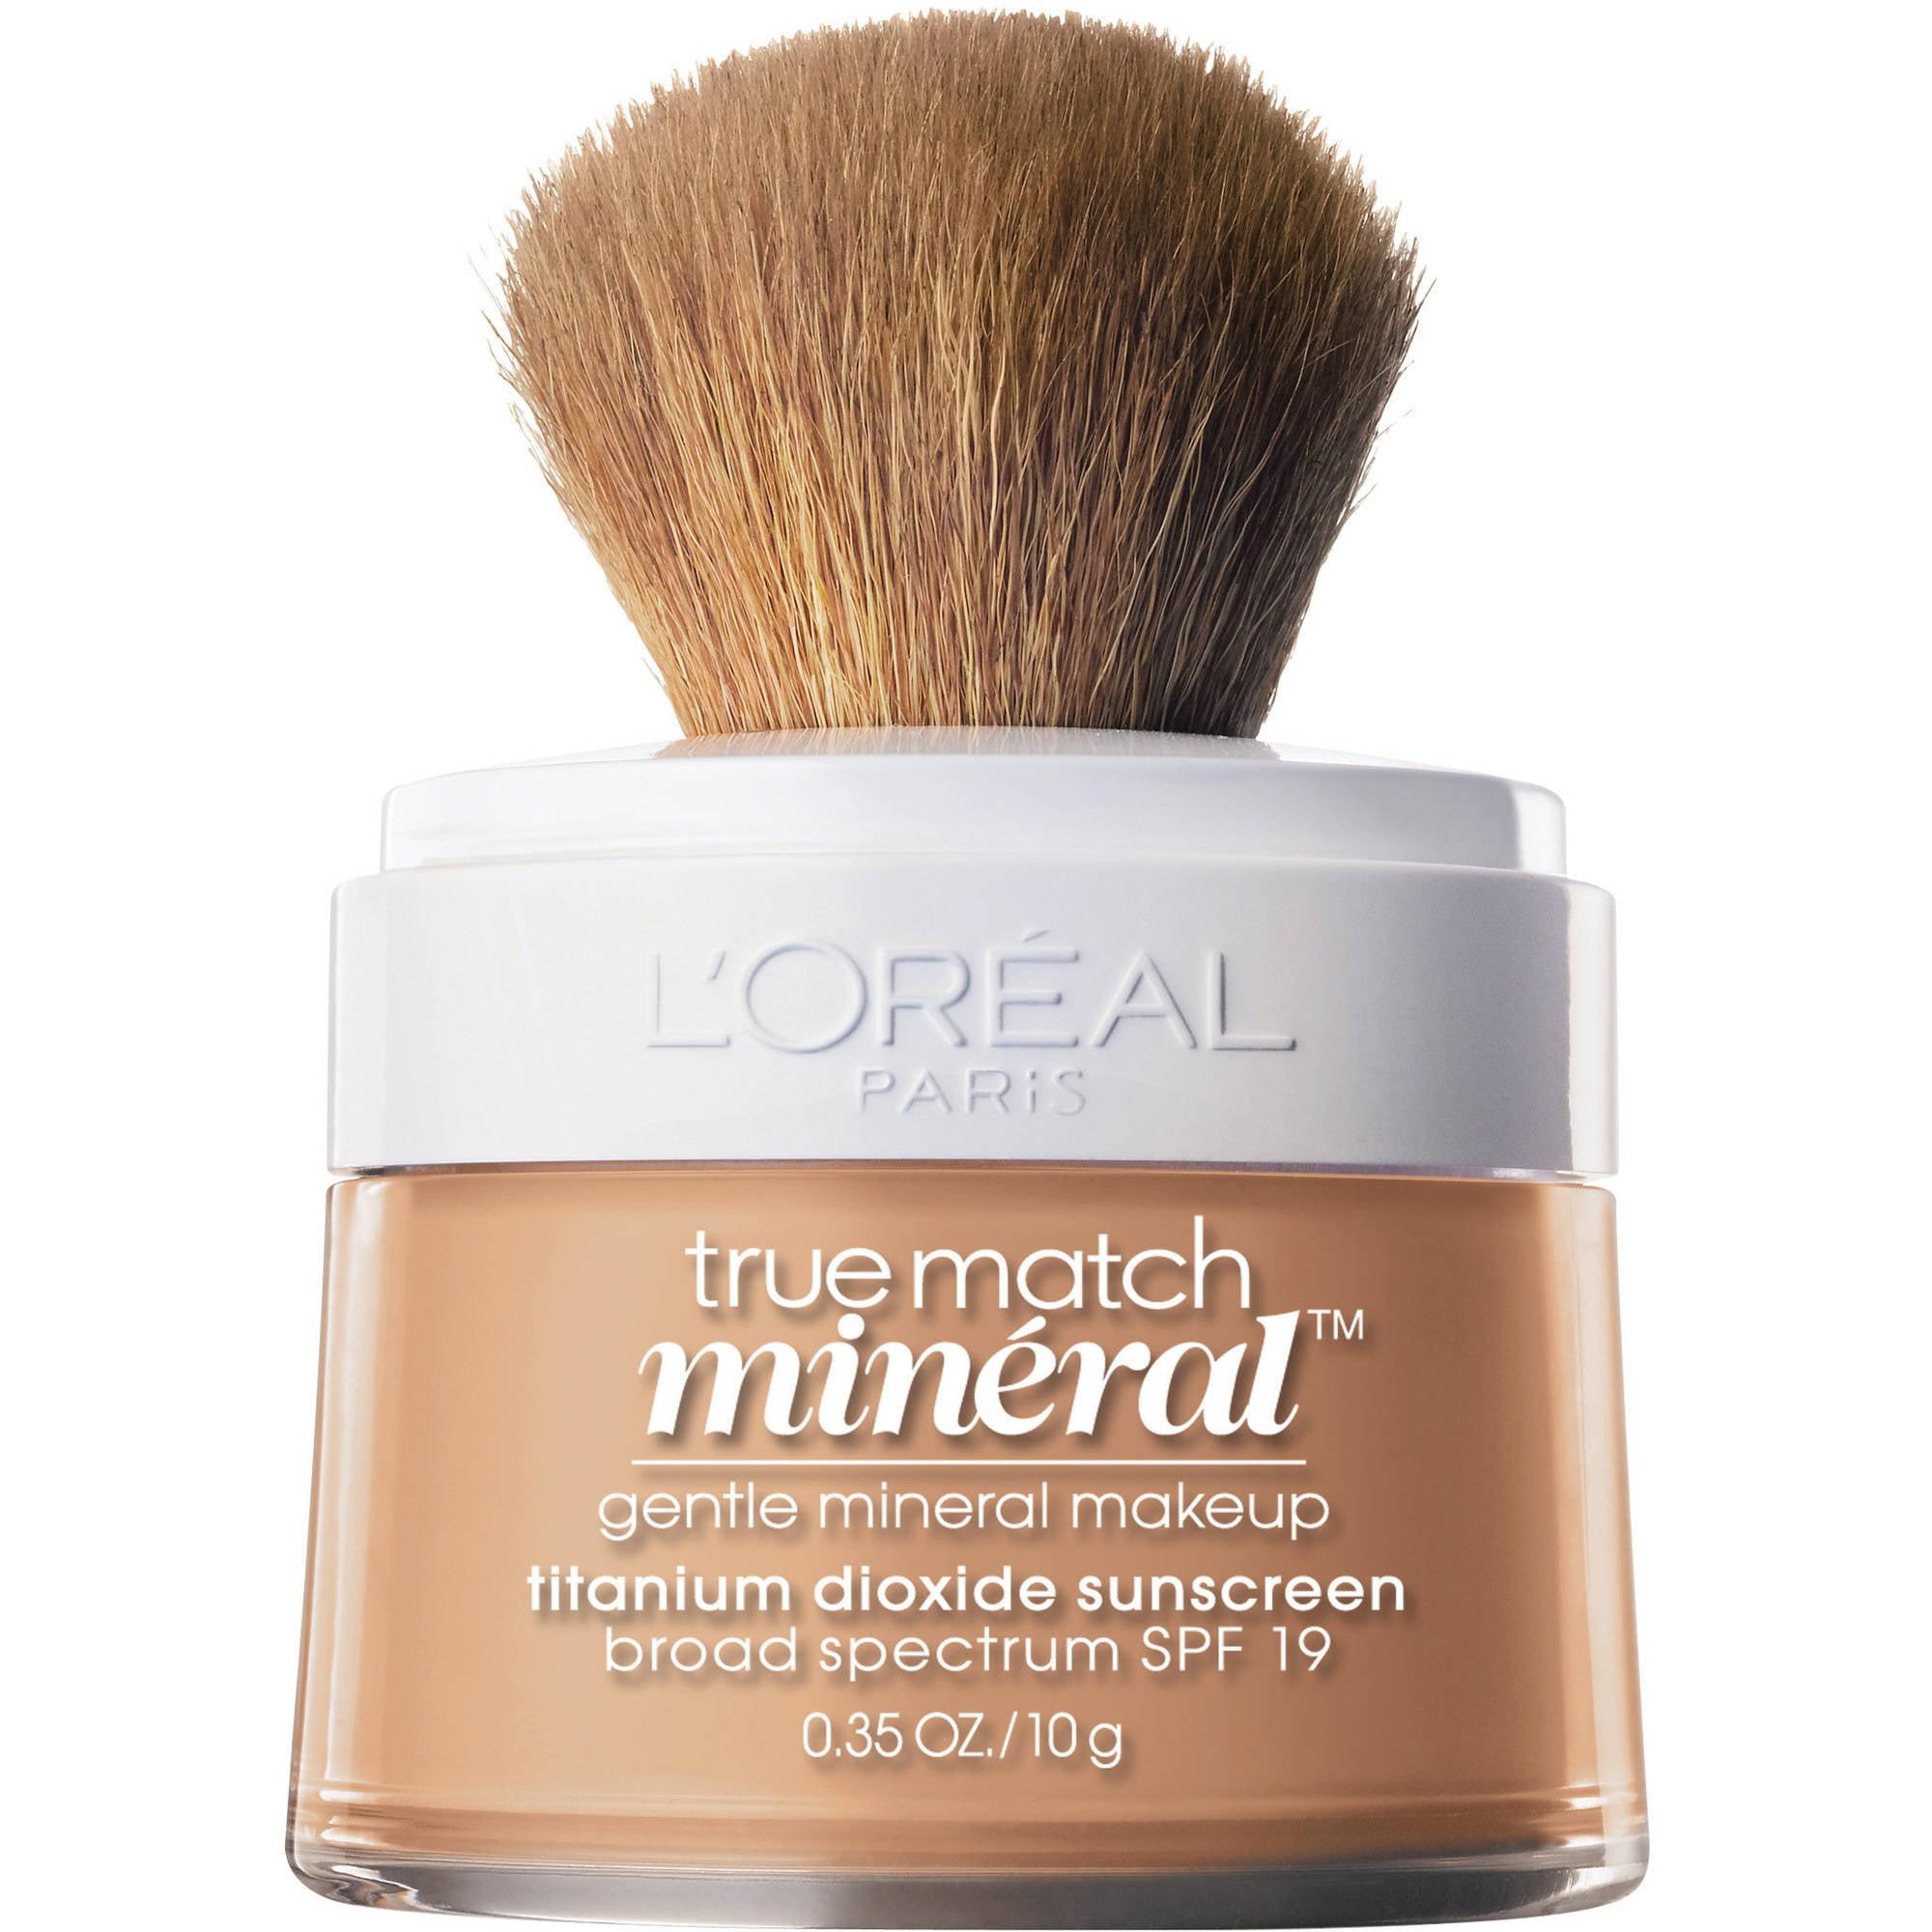 L'Oreal Paris True Match Mineral Foundation